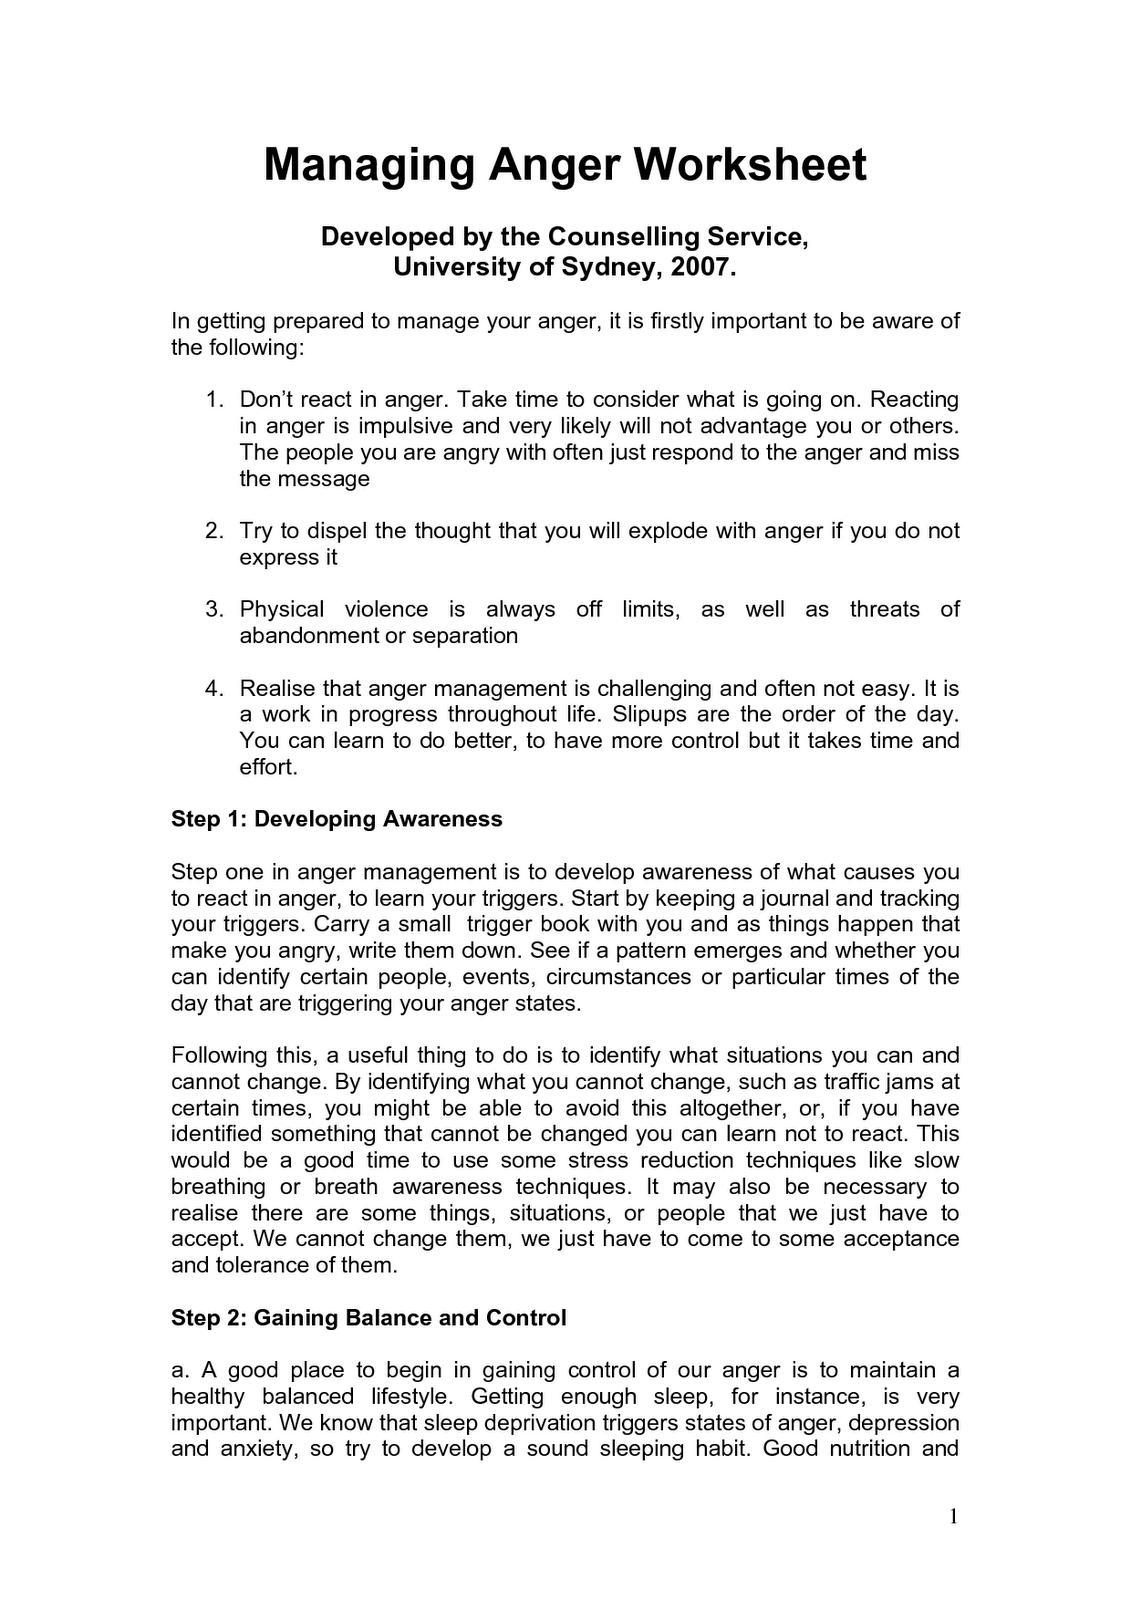 Worksheets On Anger Management For Adults